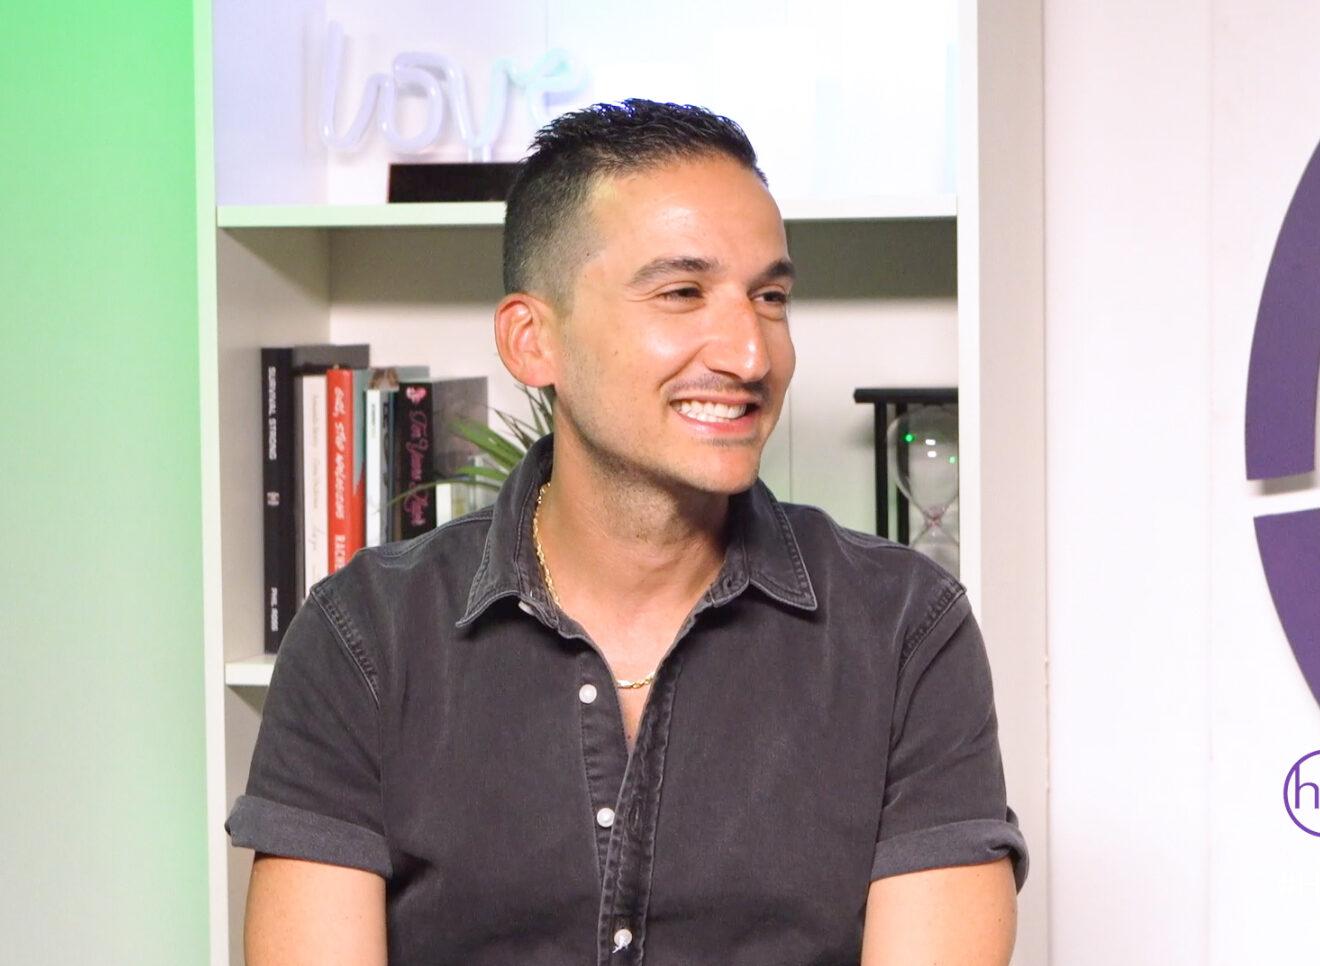 Ari Katz of Sperling Dermatology on #HipNJ